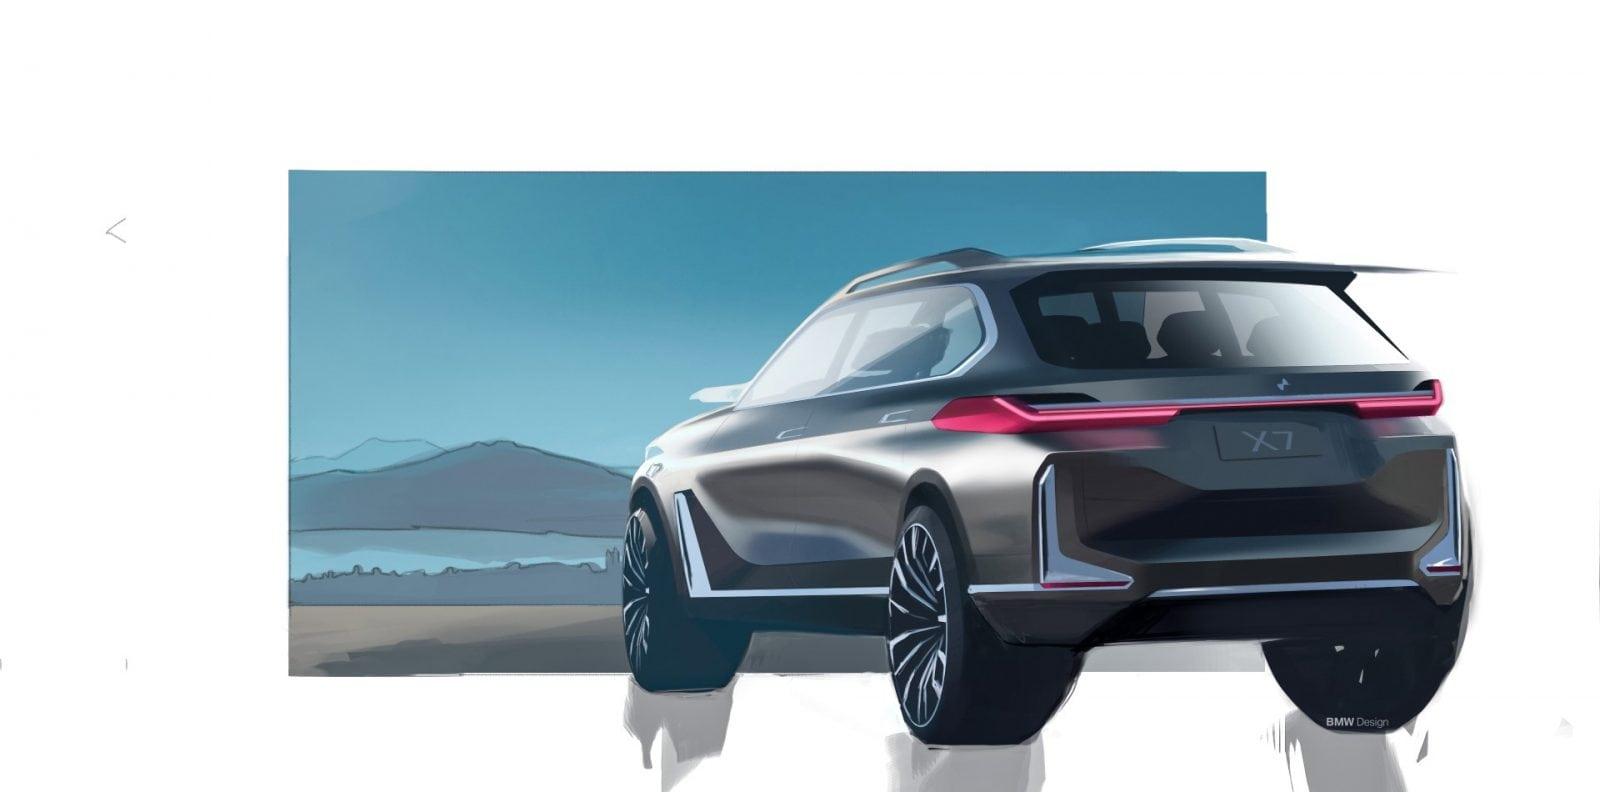 BMW Concept X7 iPerformance 2017 Design Sketches